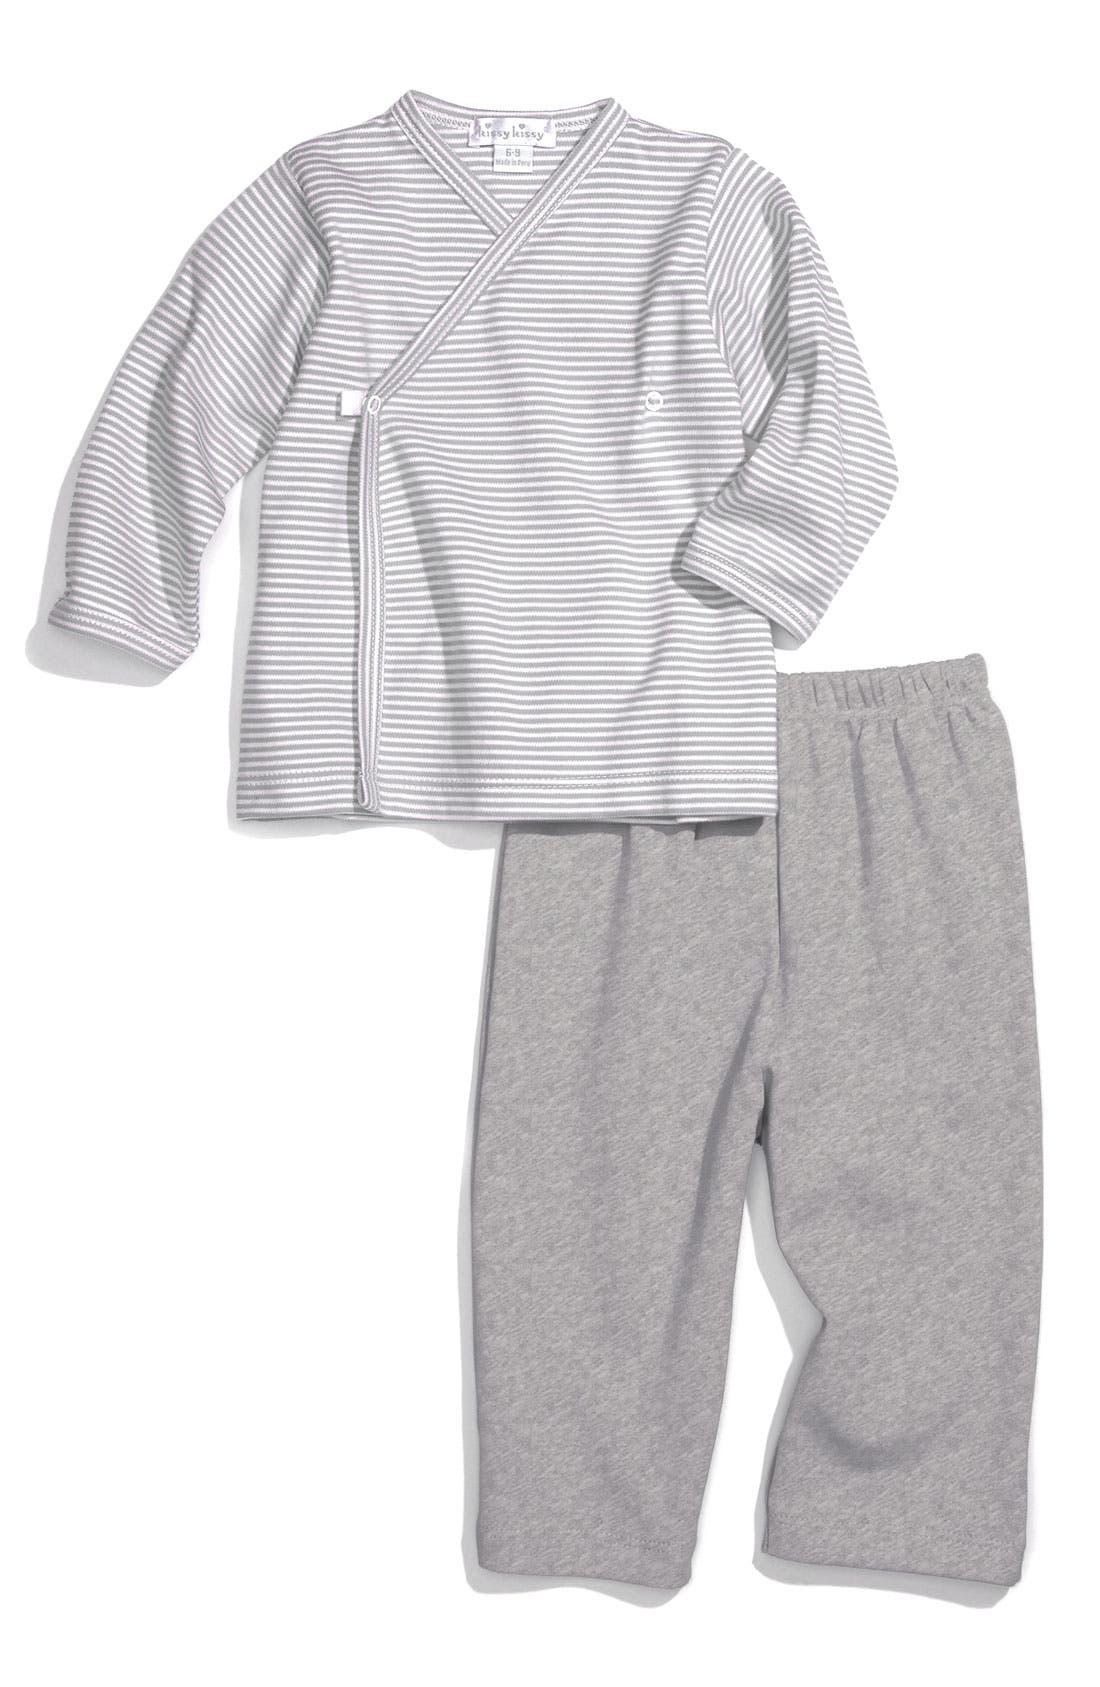 Main Image - Kissy Kissy Top & Pants Set (Infant)